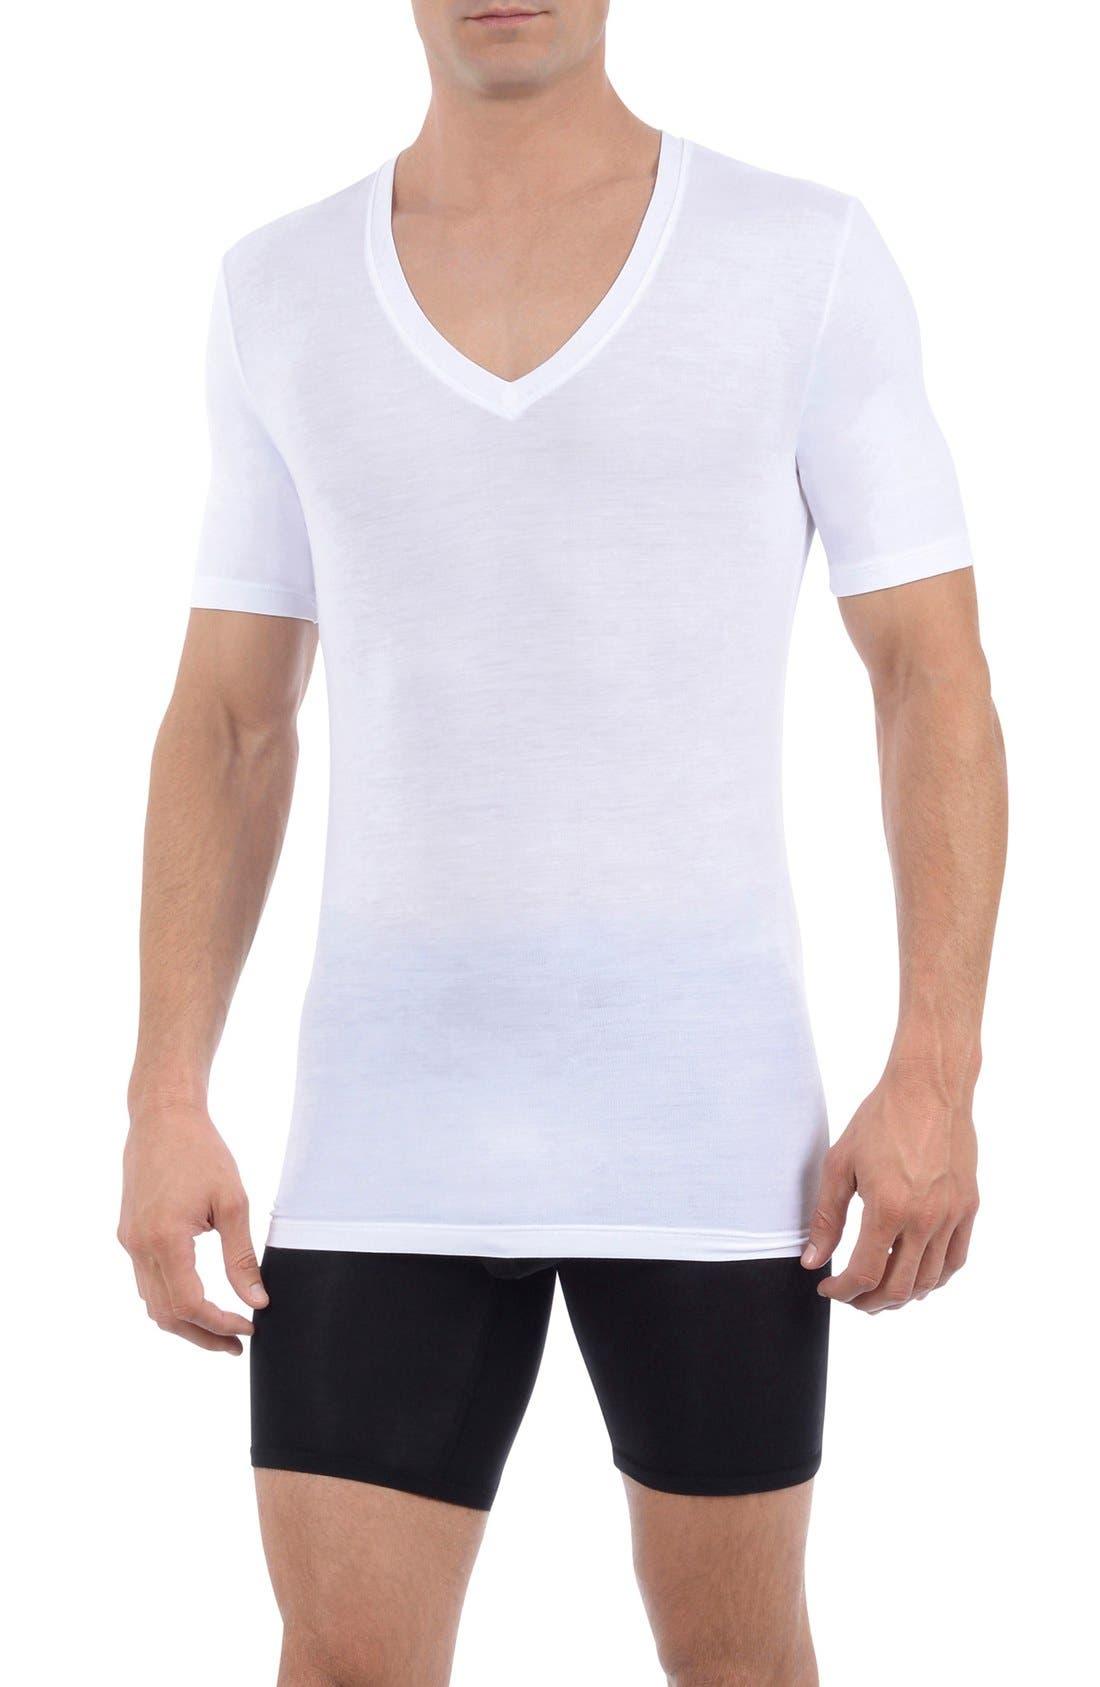 Second Skin Micromodal Deep V-Neck Undershirt,                             Main thumbnail 1, color,                             WHITE